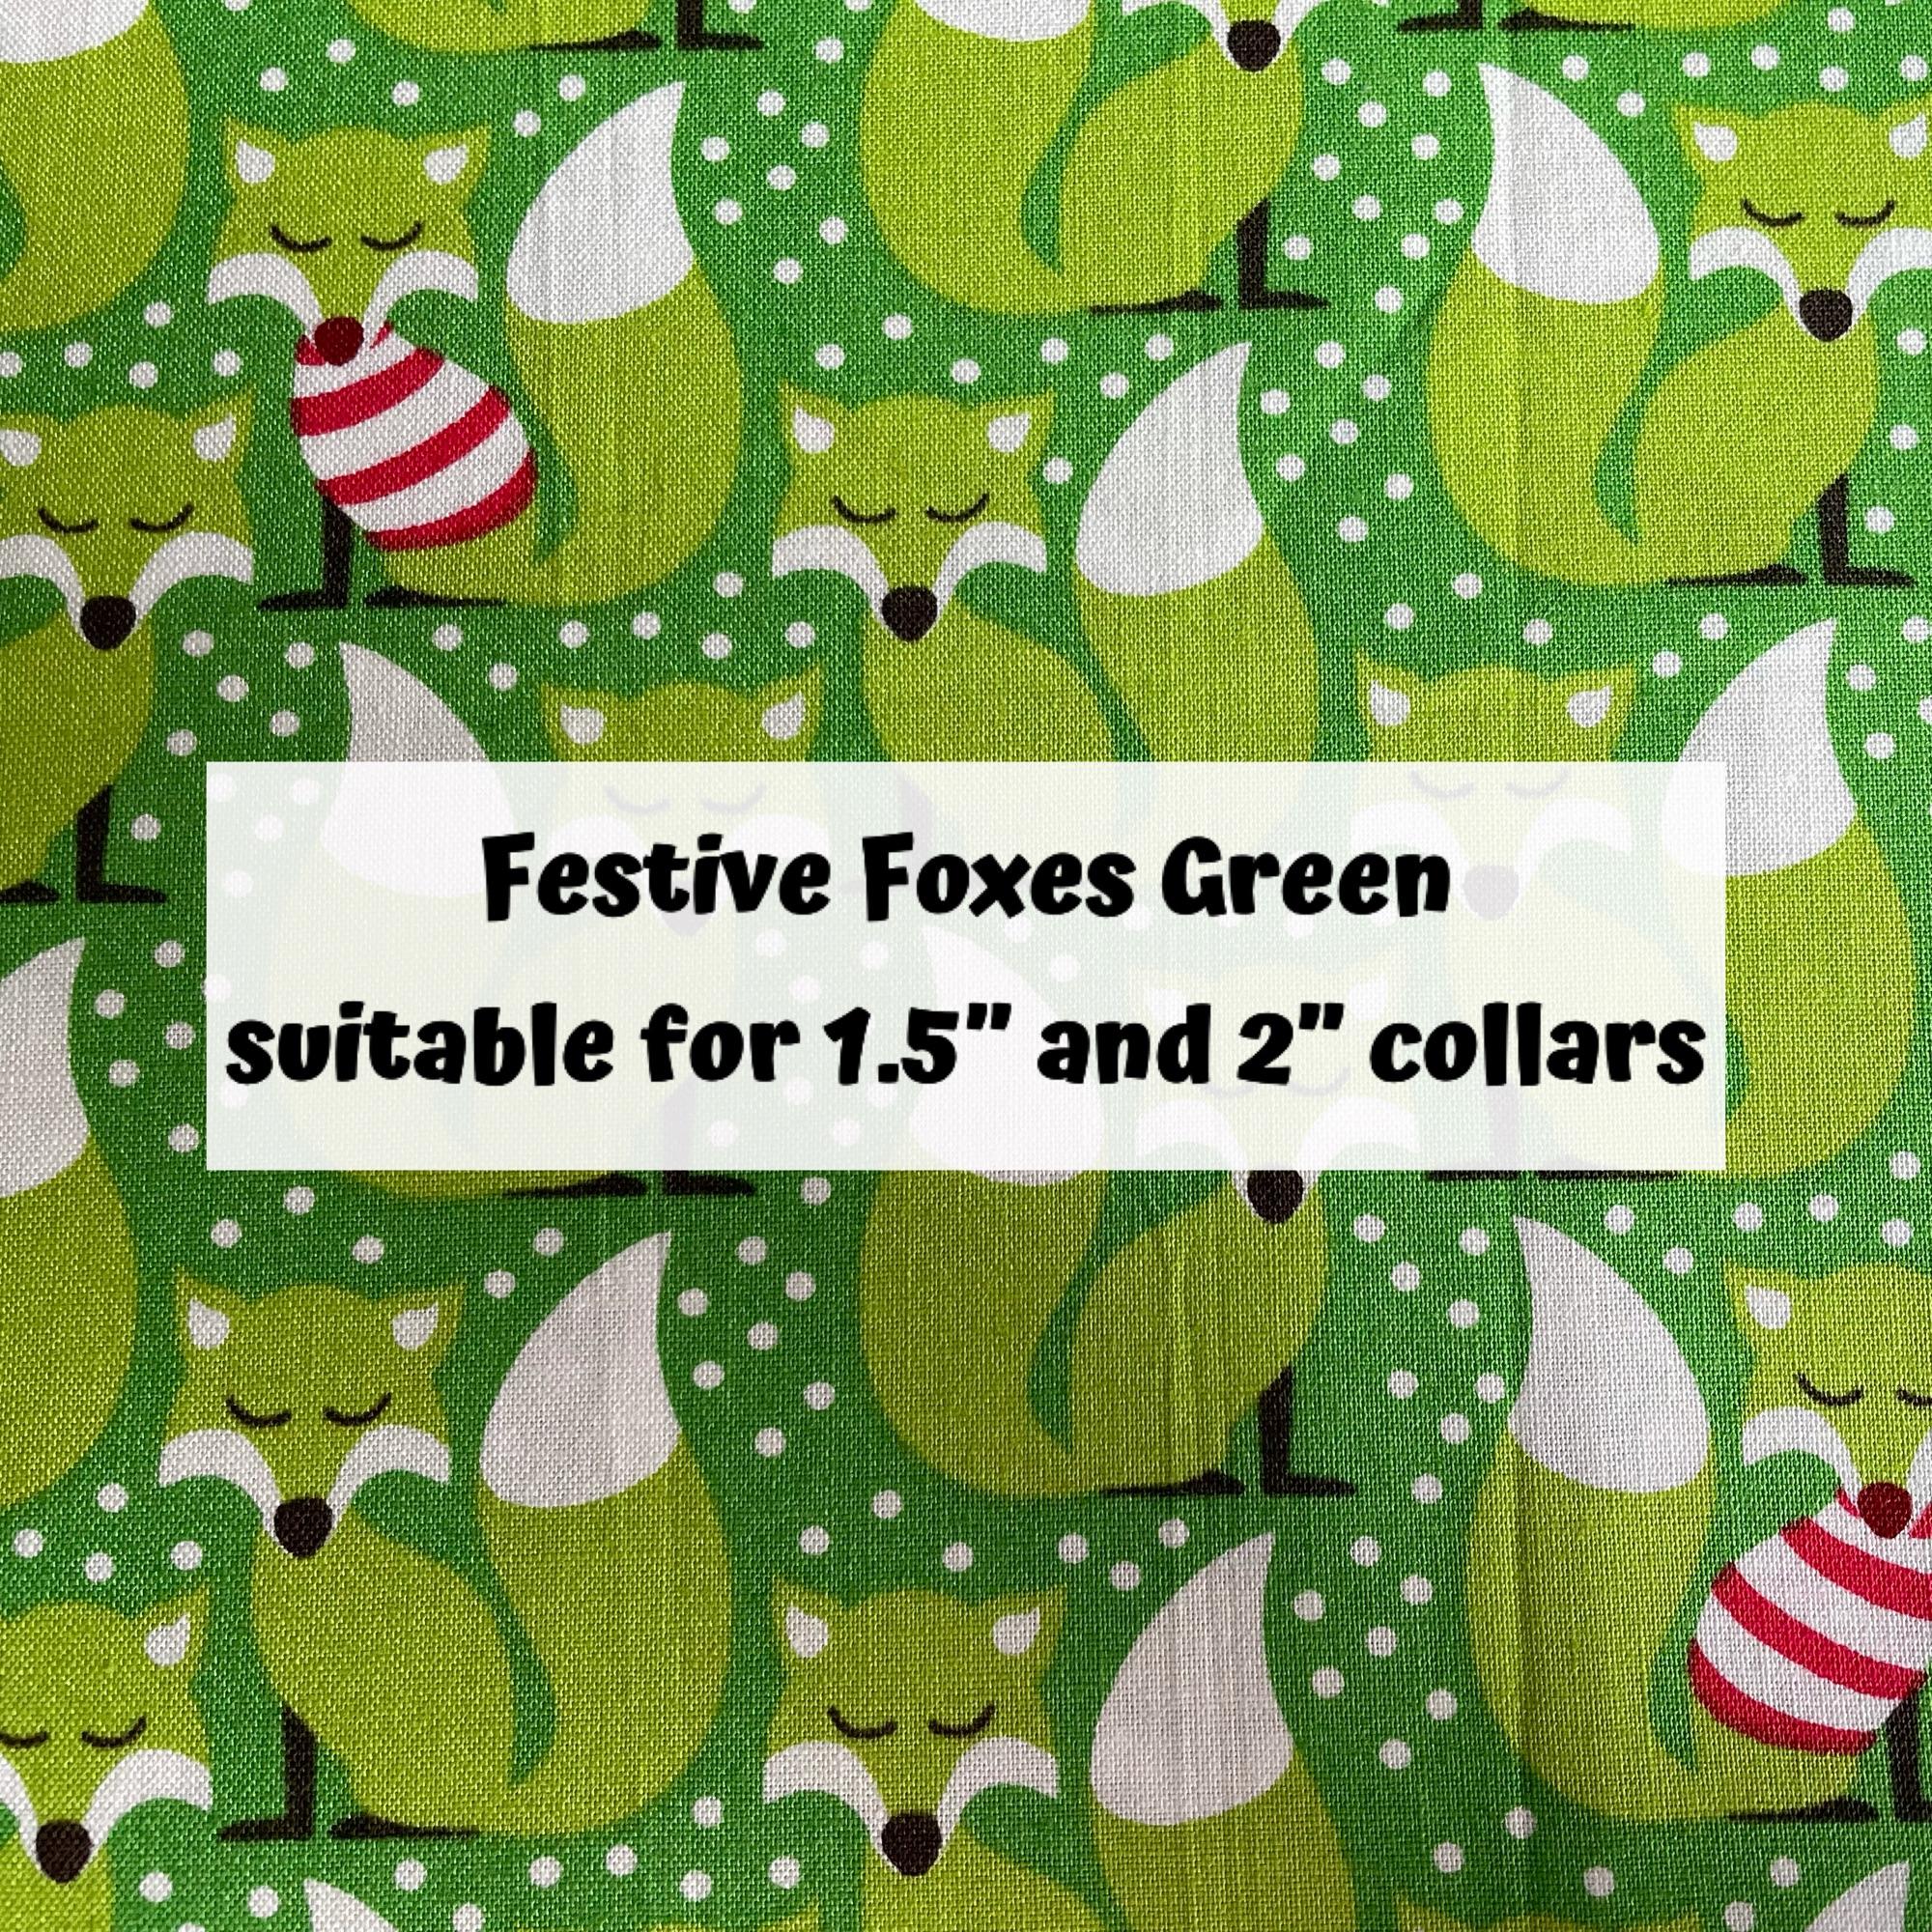 Festive Foxes Green